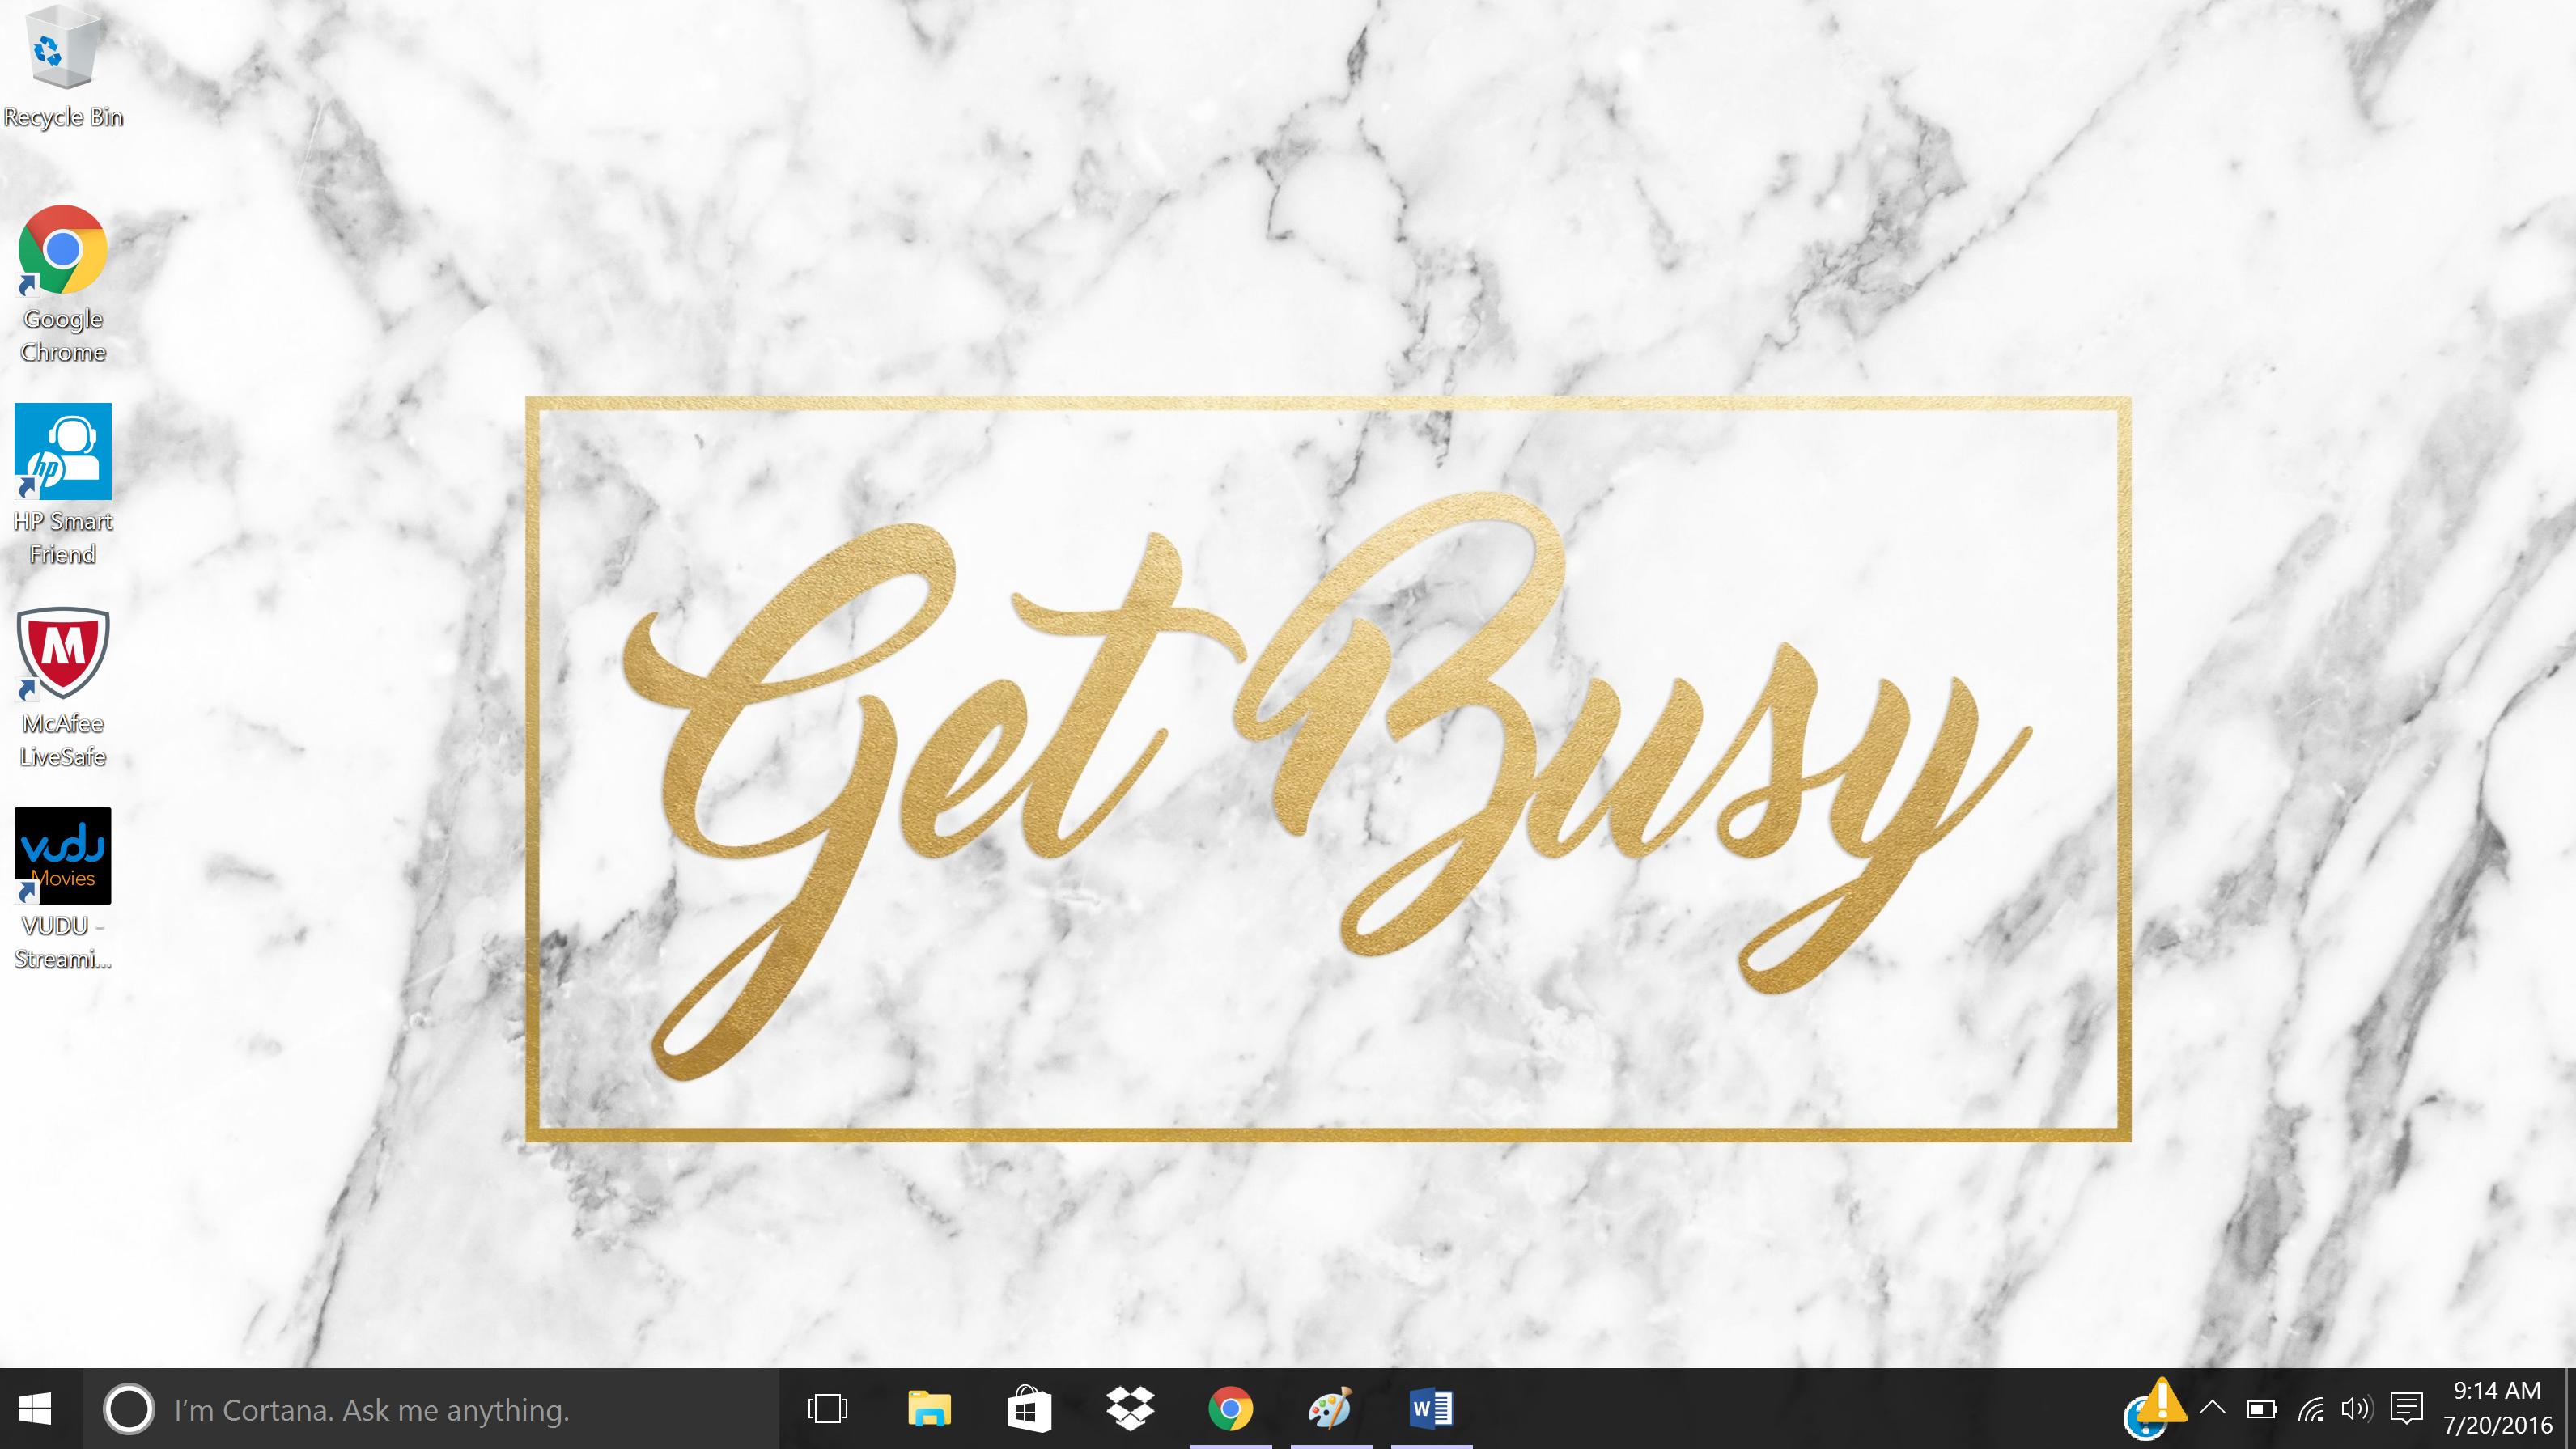 The Ultimate Guide To Using Your Computer In College Ew Pt Marble Desktop Wallpaper Macbook Wallpaper Backgrounds Desktop